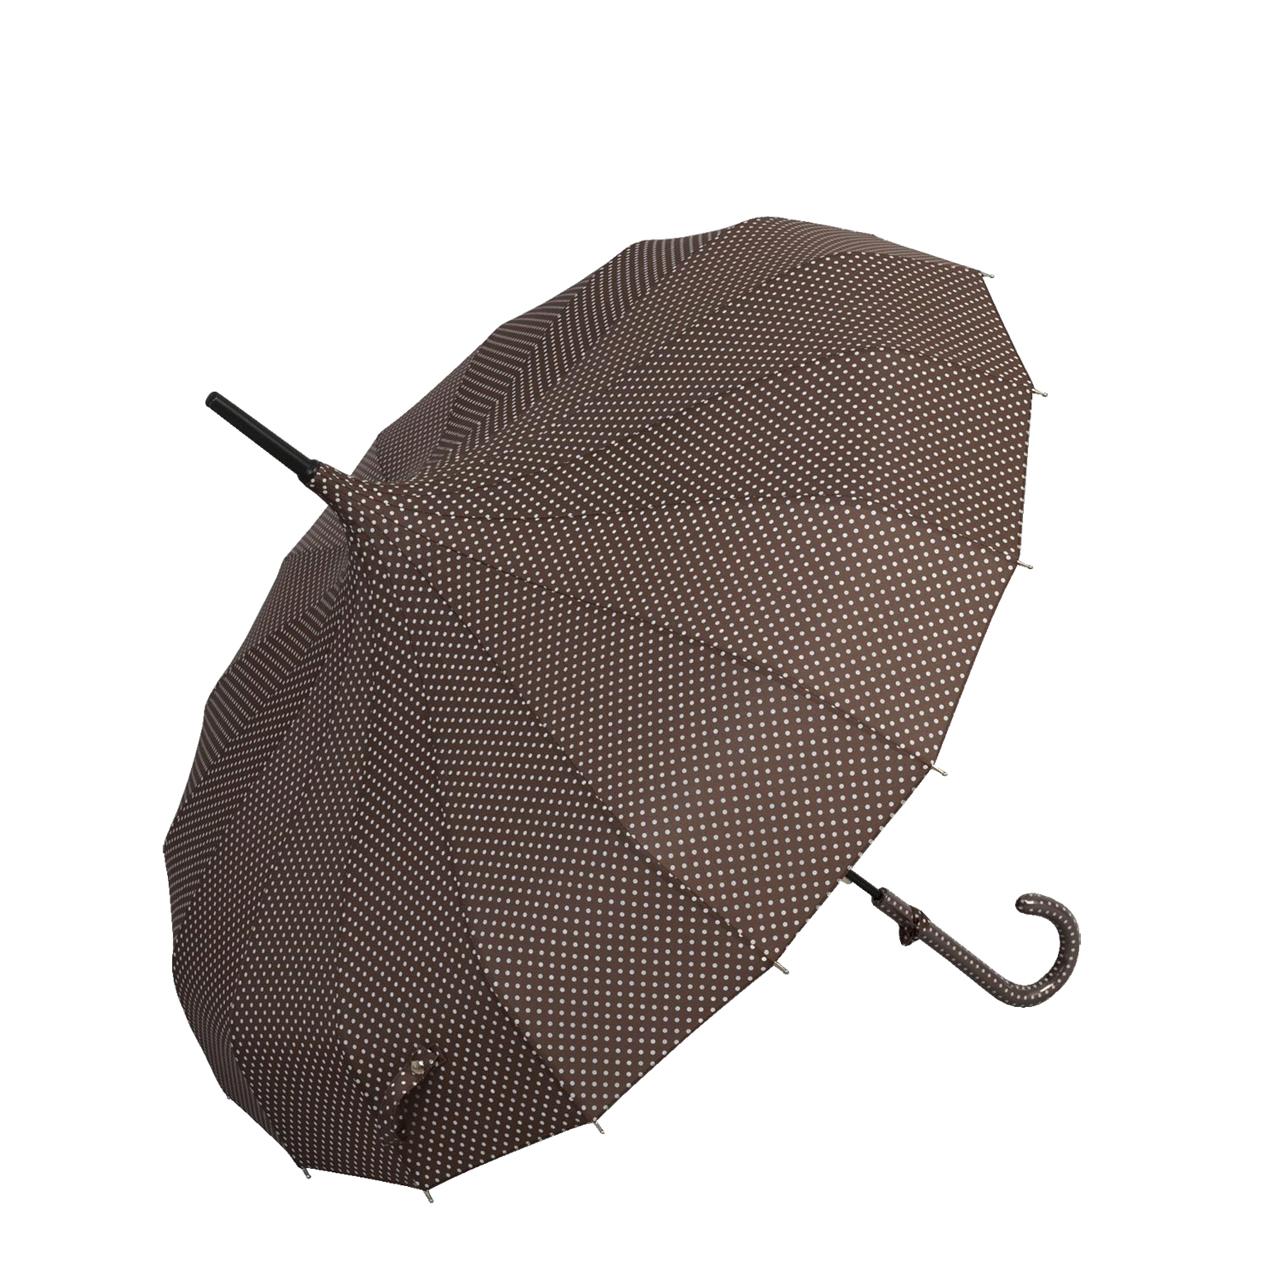 Umbrela Din Textil Maro Cu Buline Albe